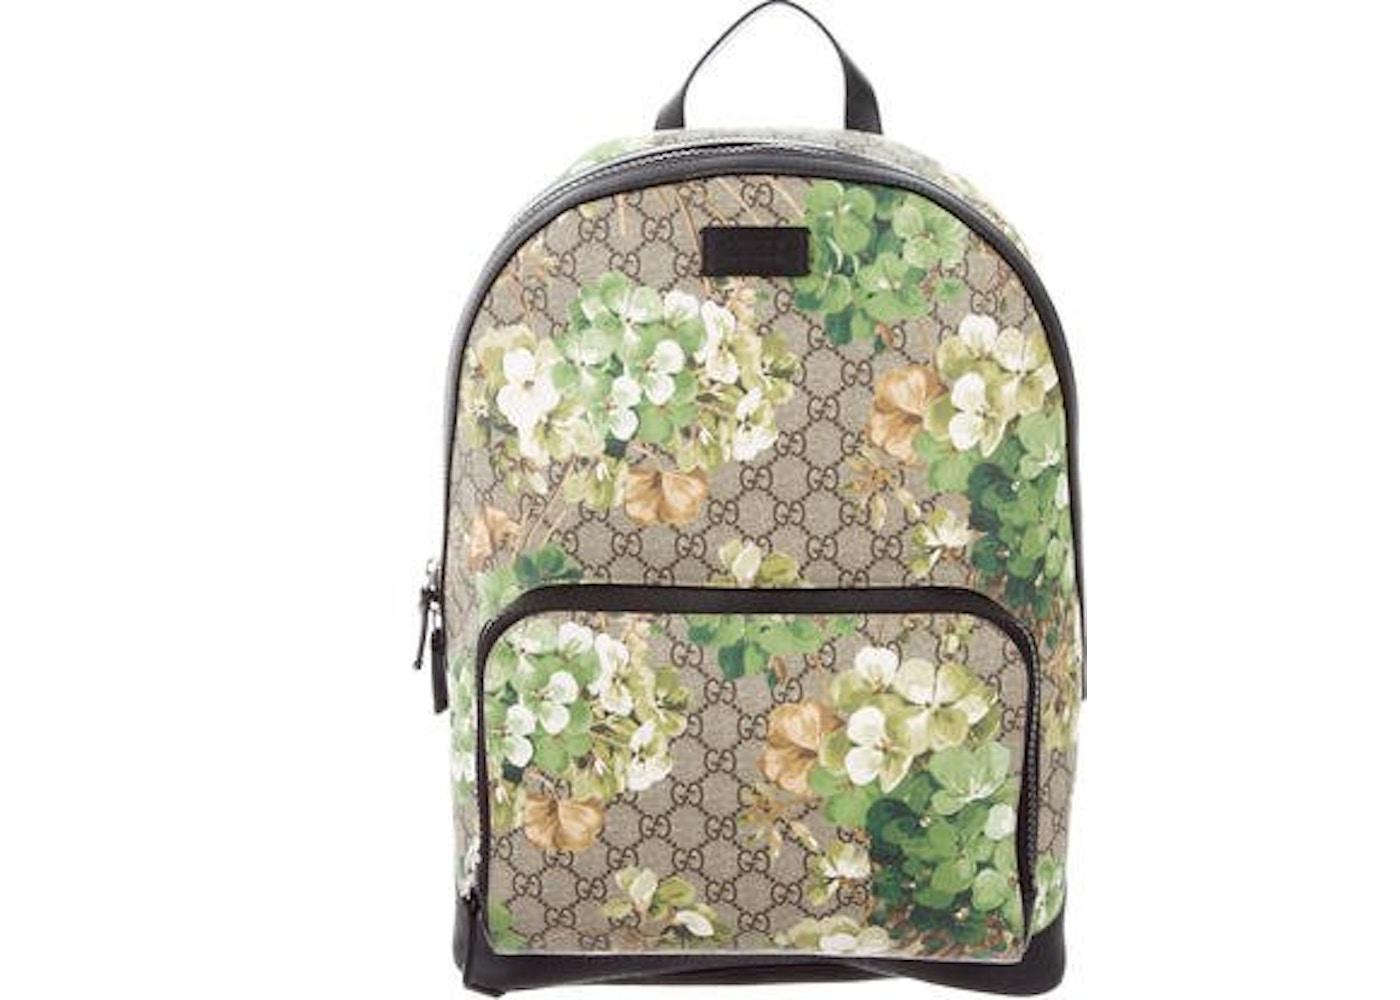 ced0a7f0261385 Gucci GG Supreme Backpack GG Supreme Floral Print Beige/Ebony ...